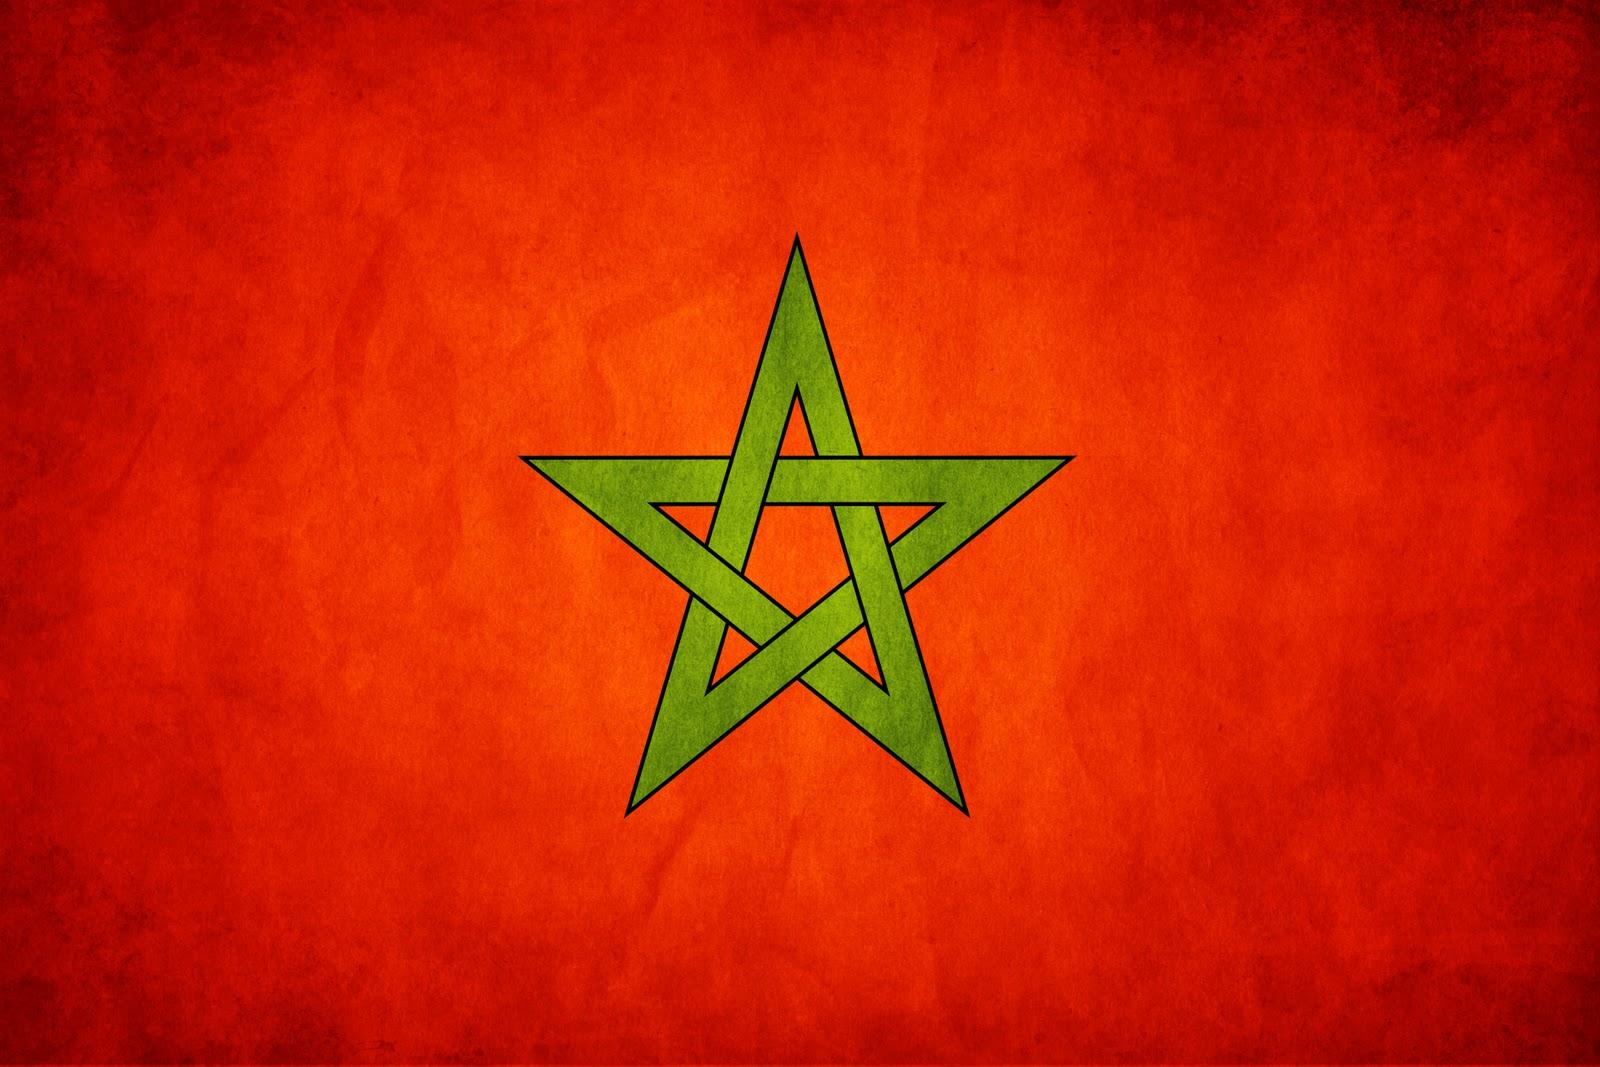 http://2.bp.blogspot.com/_ys7SX4JCxzo/TRjHEWi09YI/AAAAAAAAGi0/poiQAFXpY-Q/s1600/Morocco%20Flag.jpg